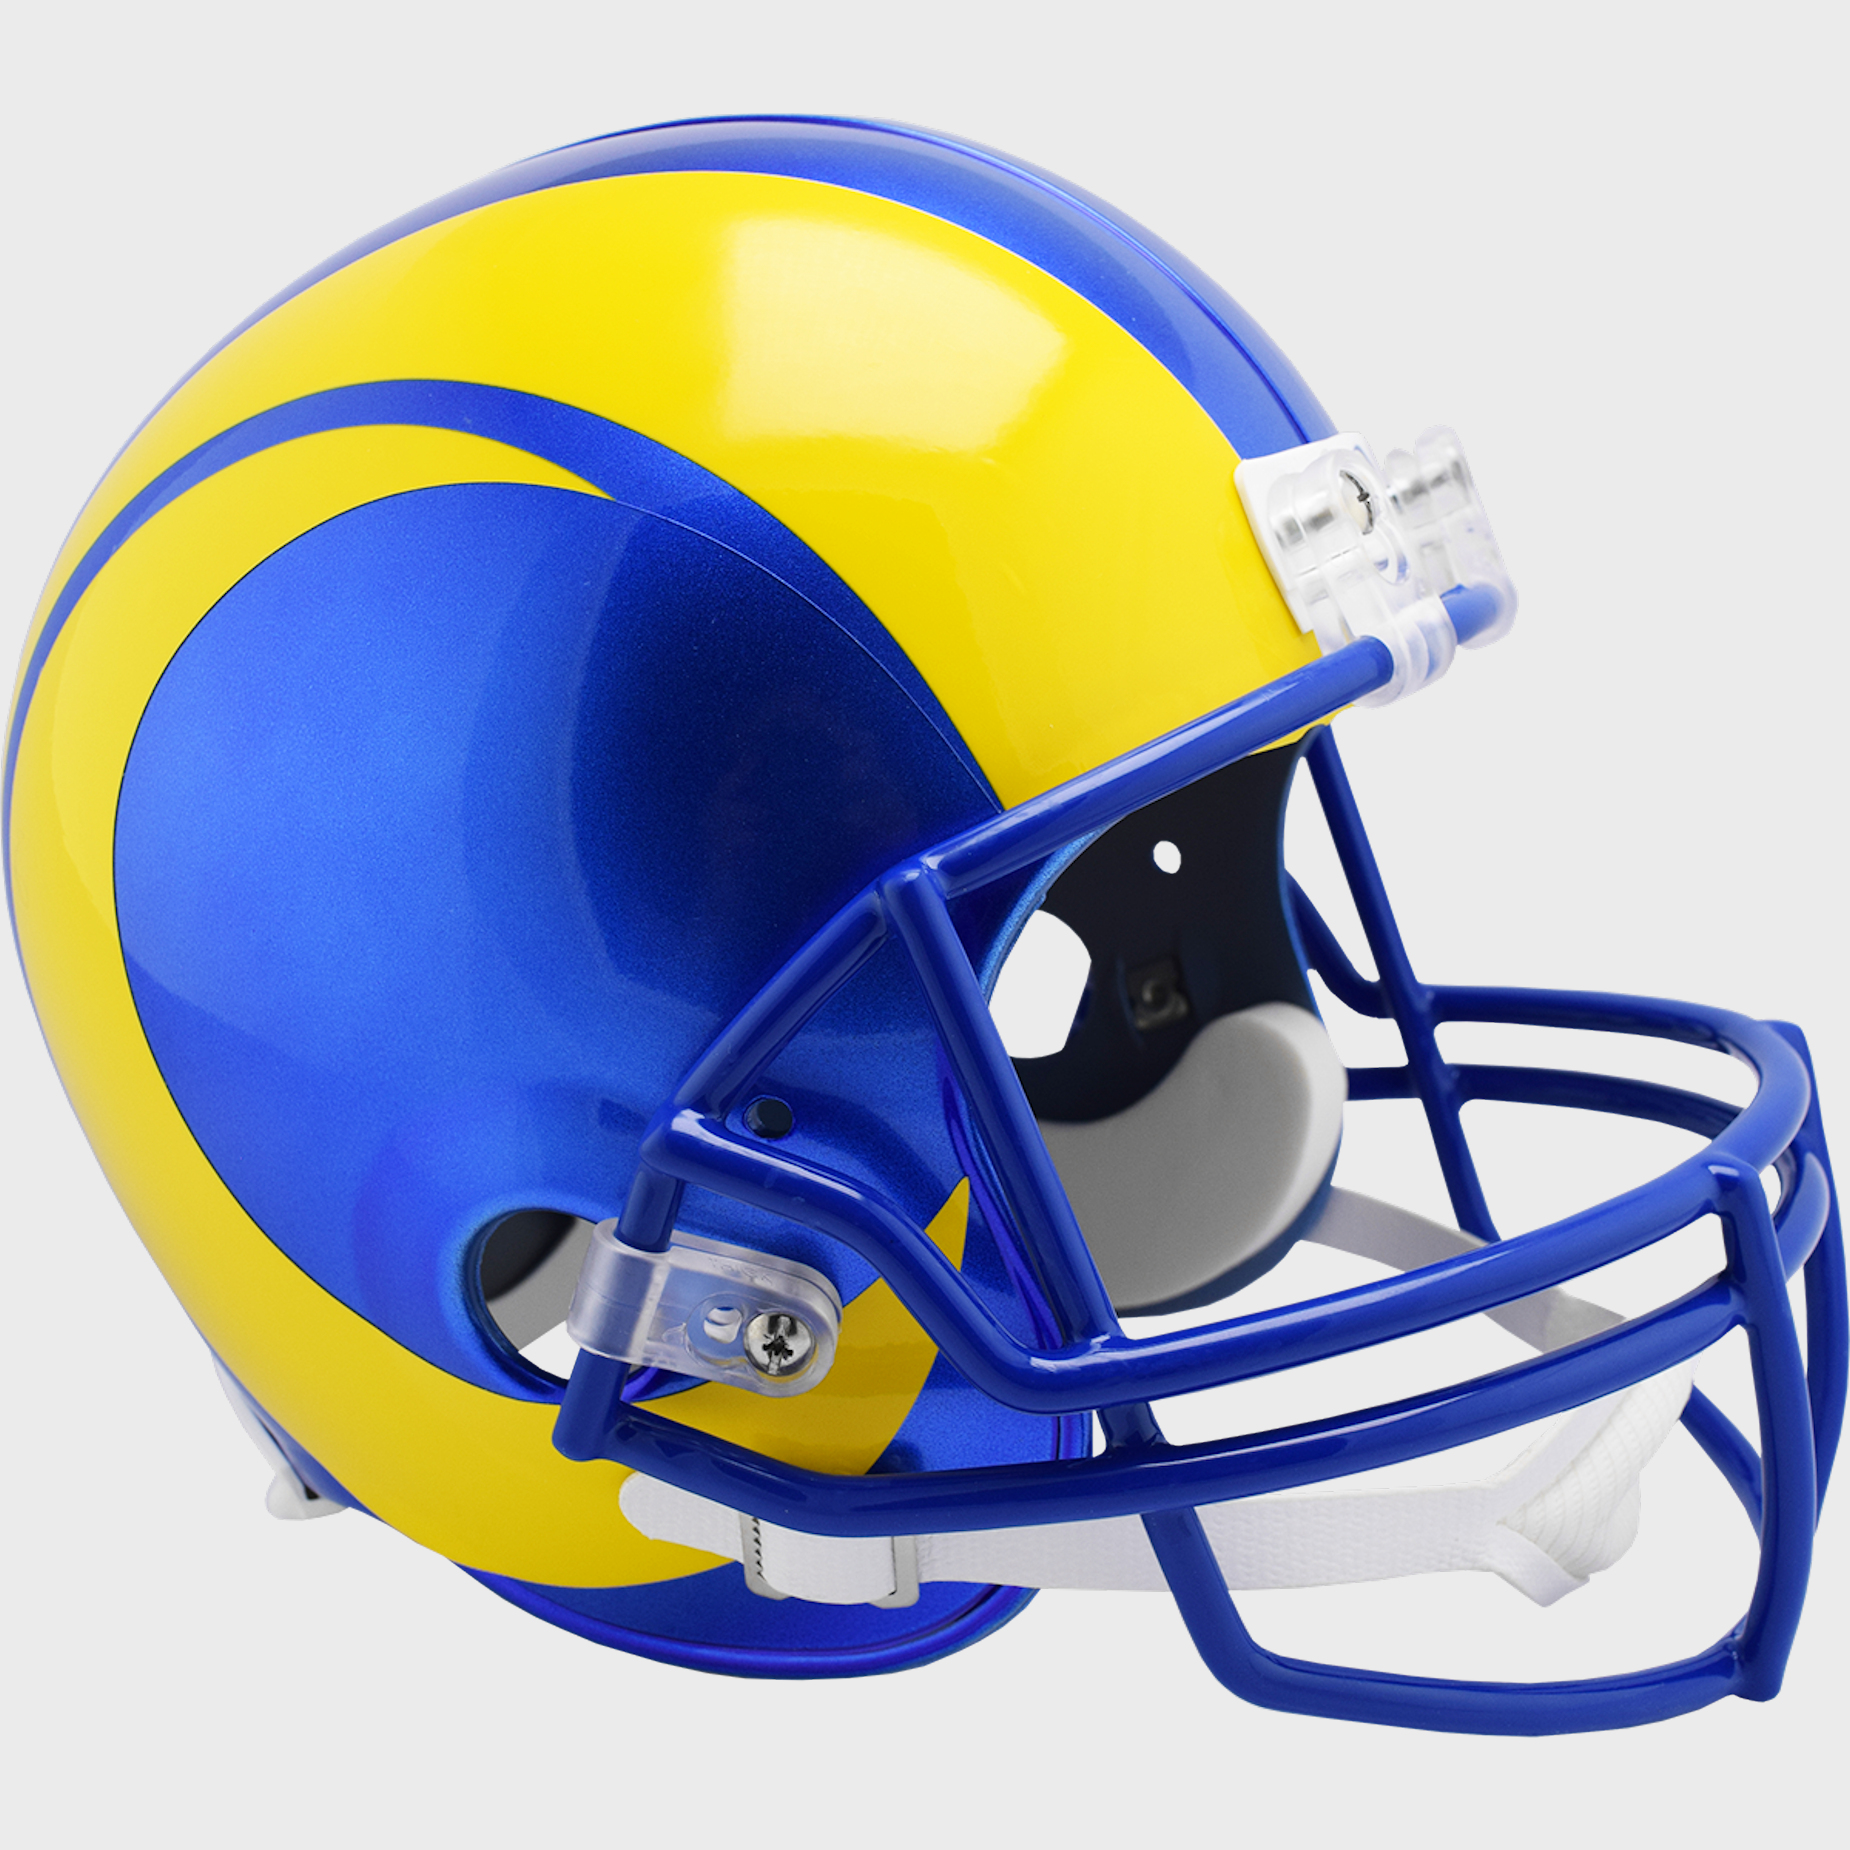 Los Angeles Rams Full Size Replica Football Helmet <B>NEW 2020</B>